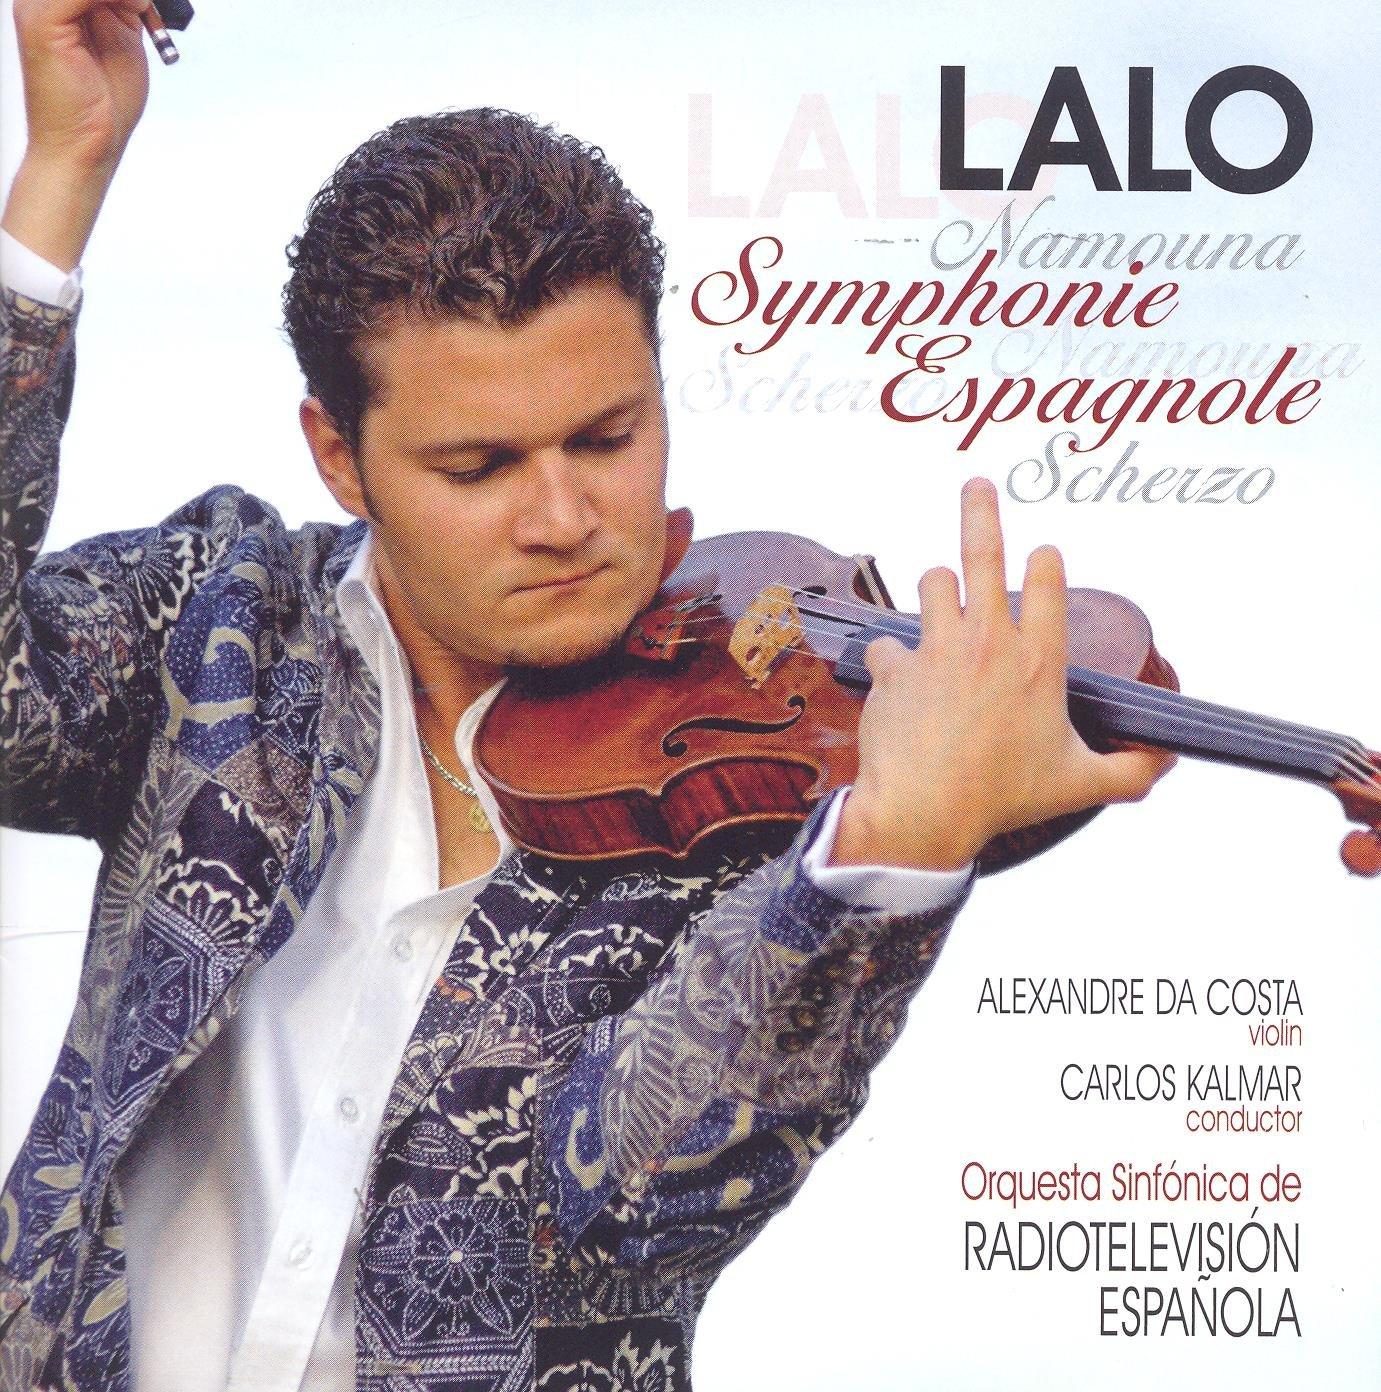 Lalo: Symphonie Espagnole / Namouna, Suites, Nos. 1 & 2 / Scherzo in D minor